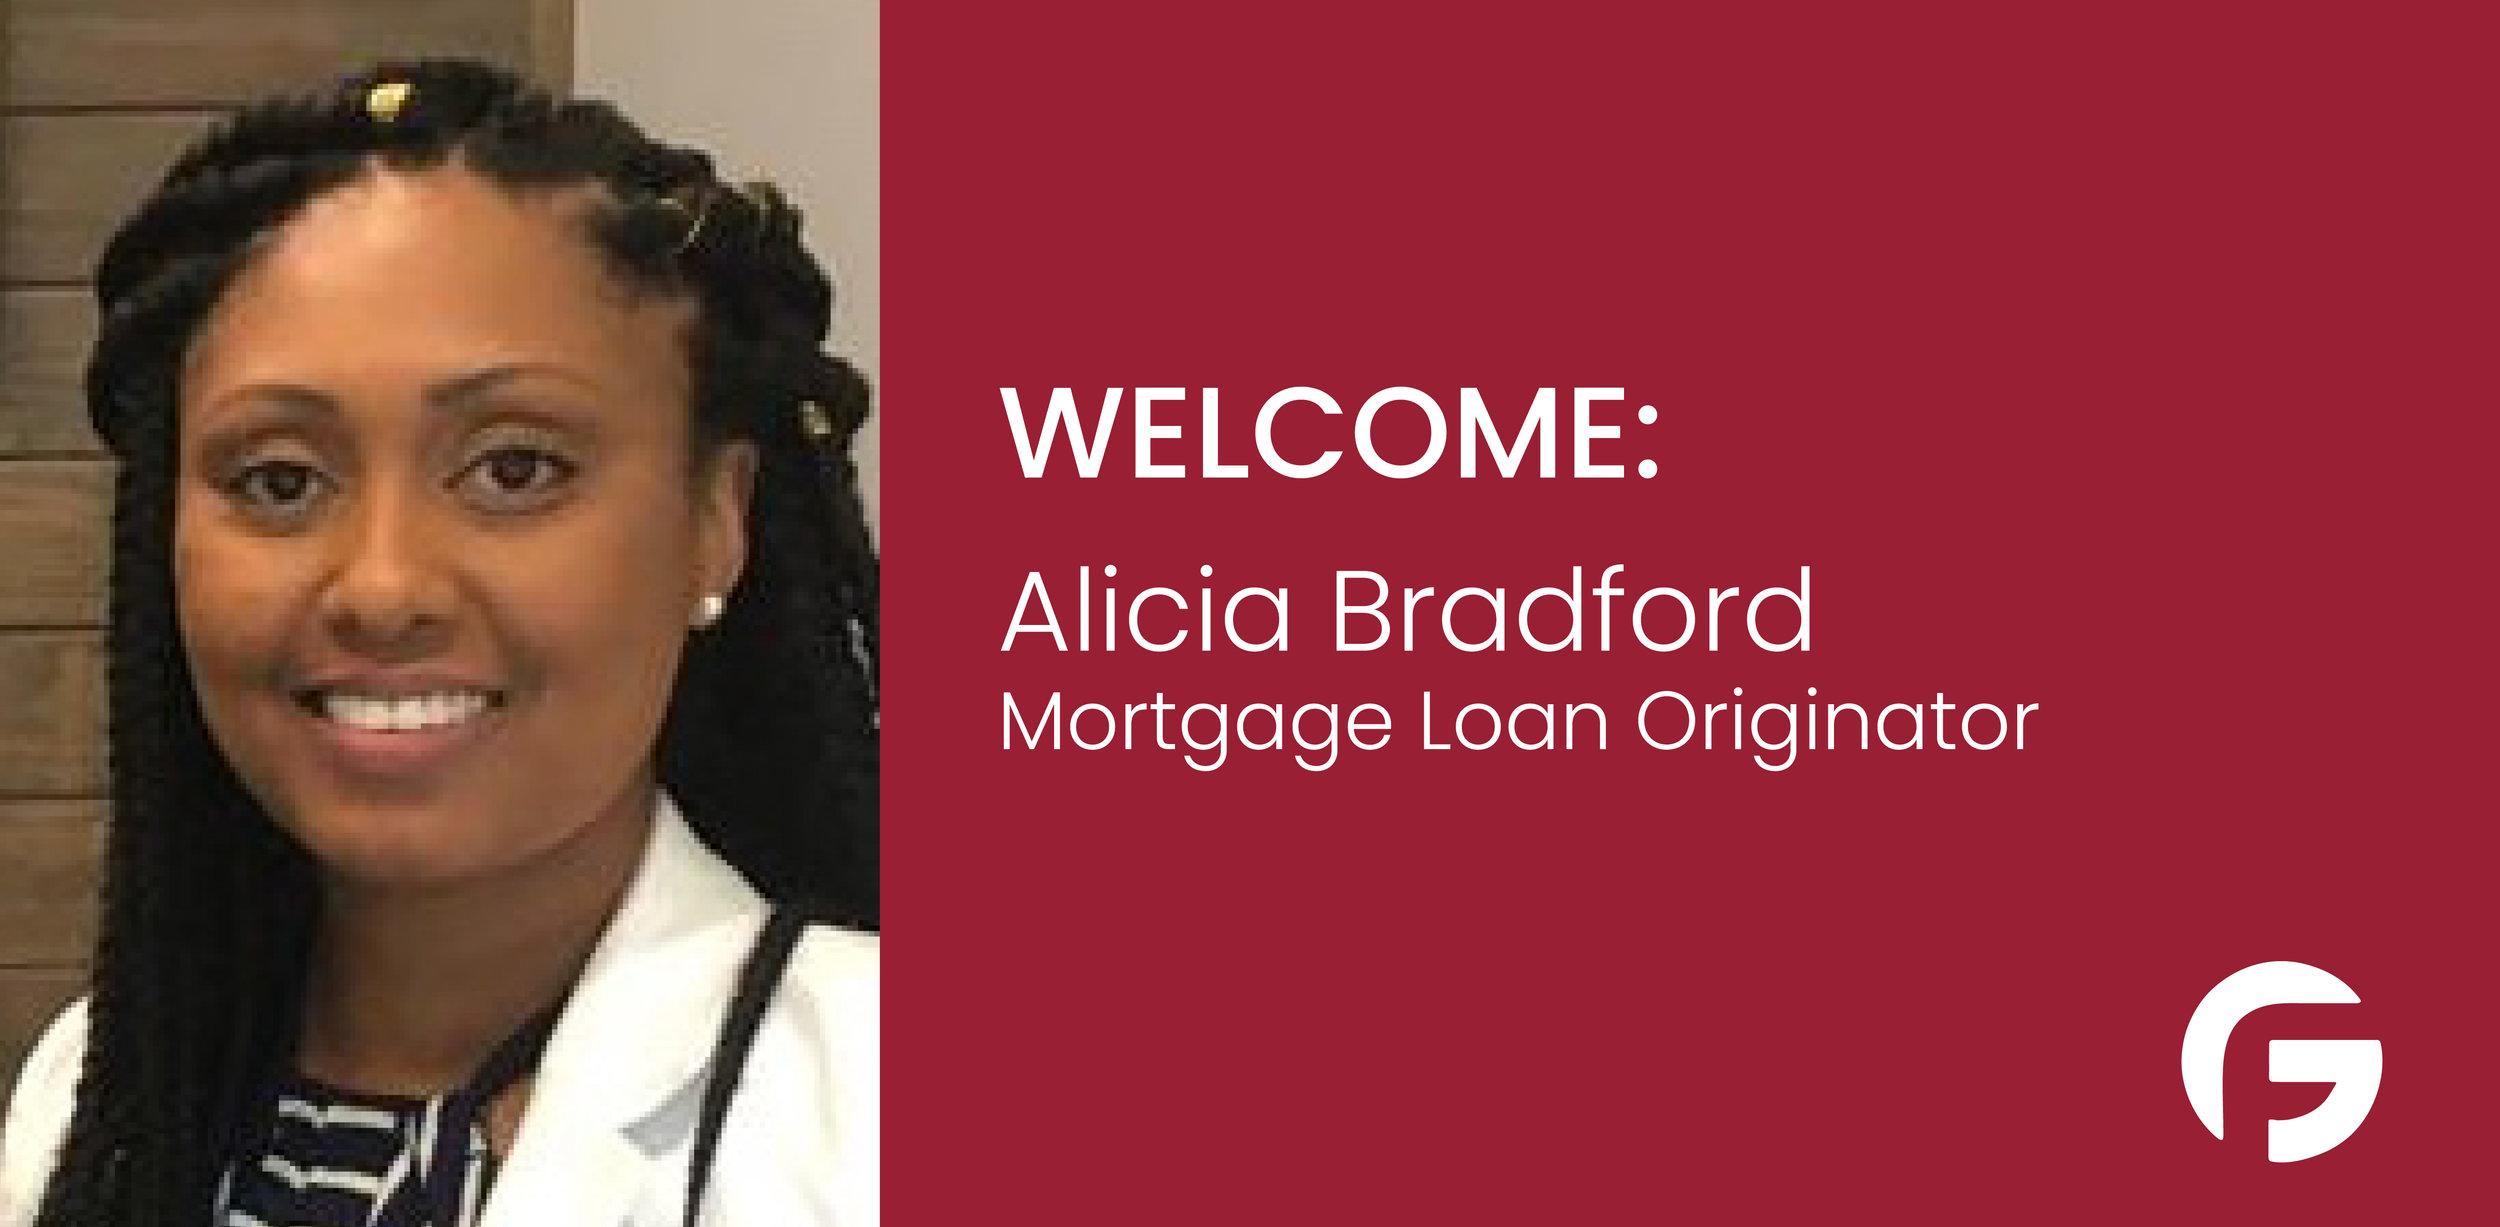 Alicia Bradford Loan Originator serving Atlanta, GA